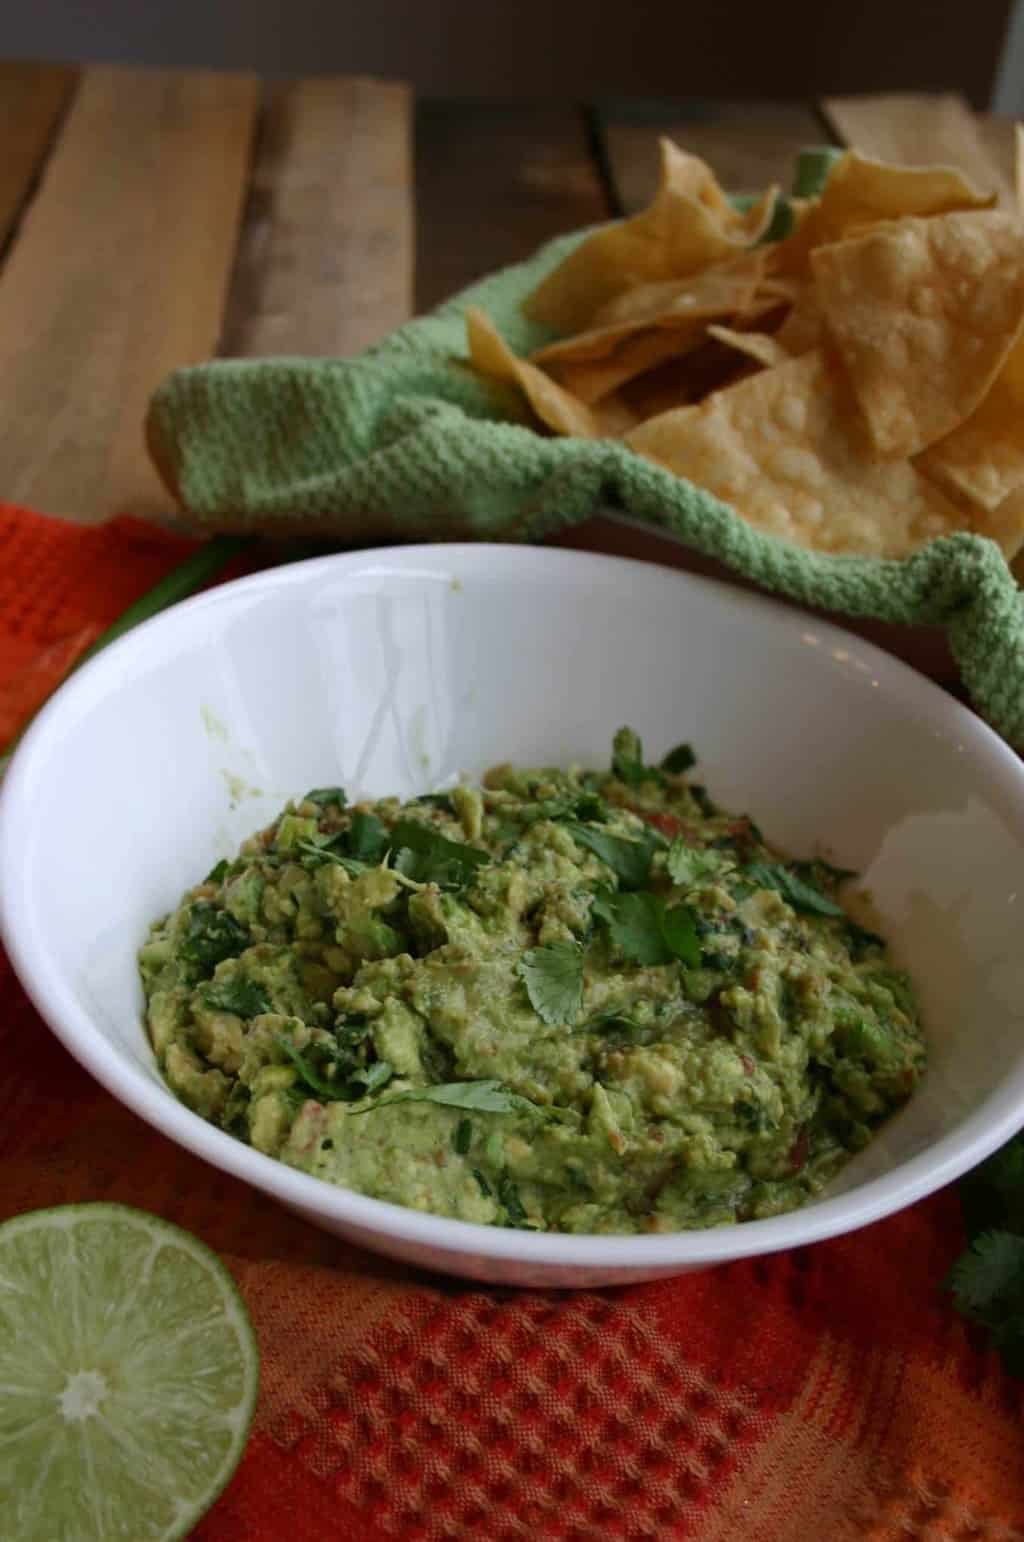 You will love this easy guacamole recipe!